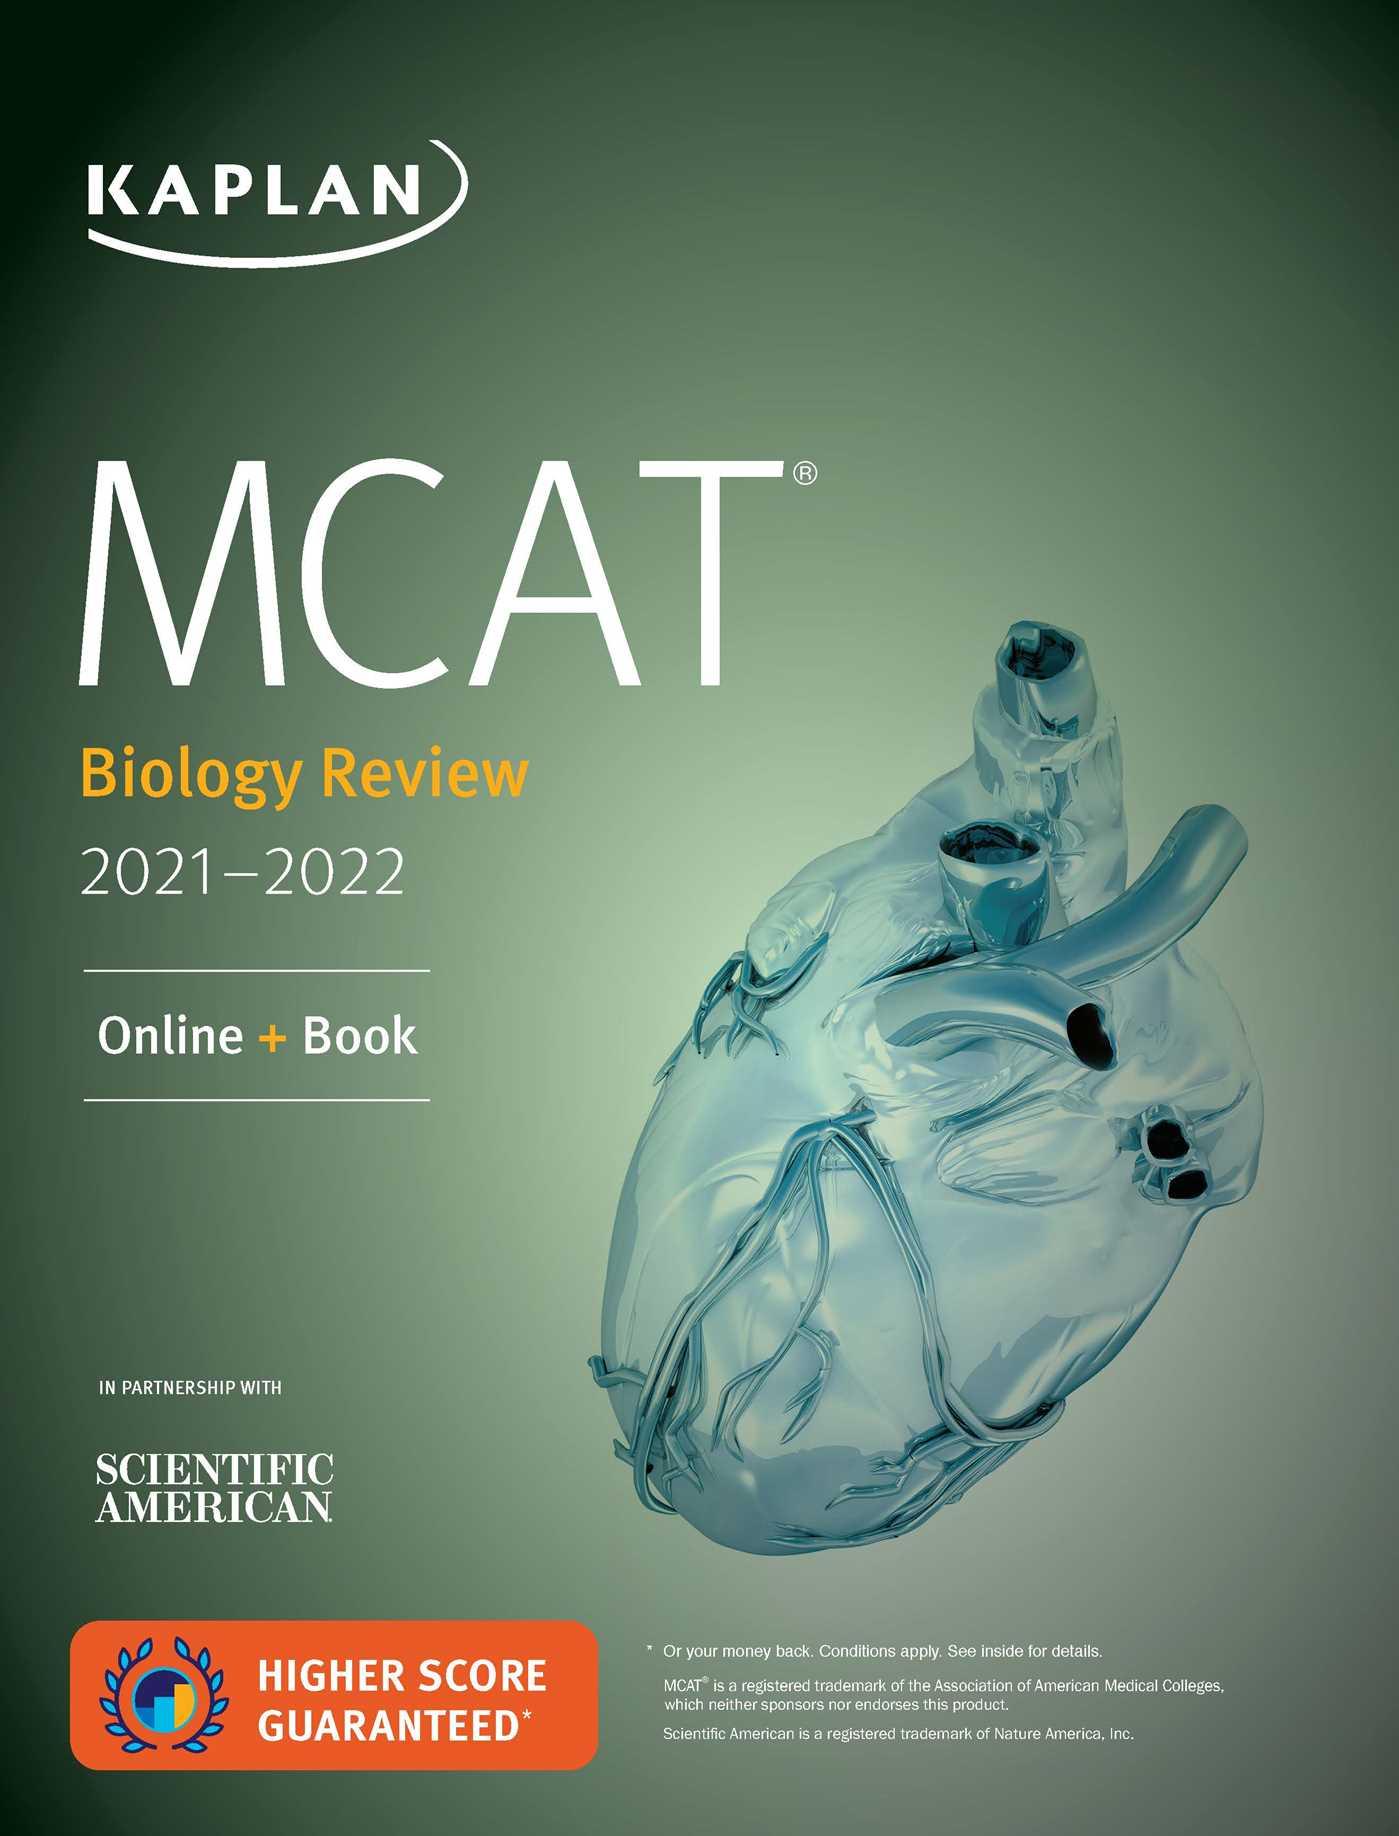 MCAT Biology Review 2021-2022: Online + Book